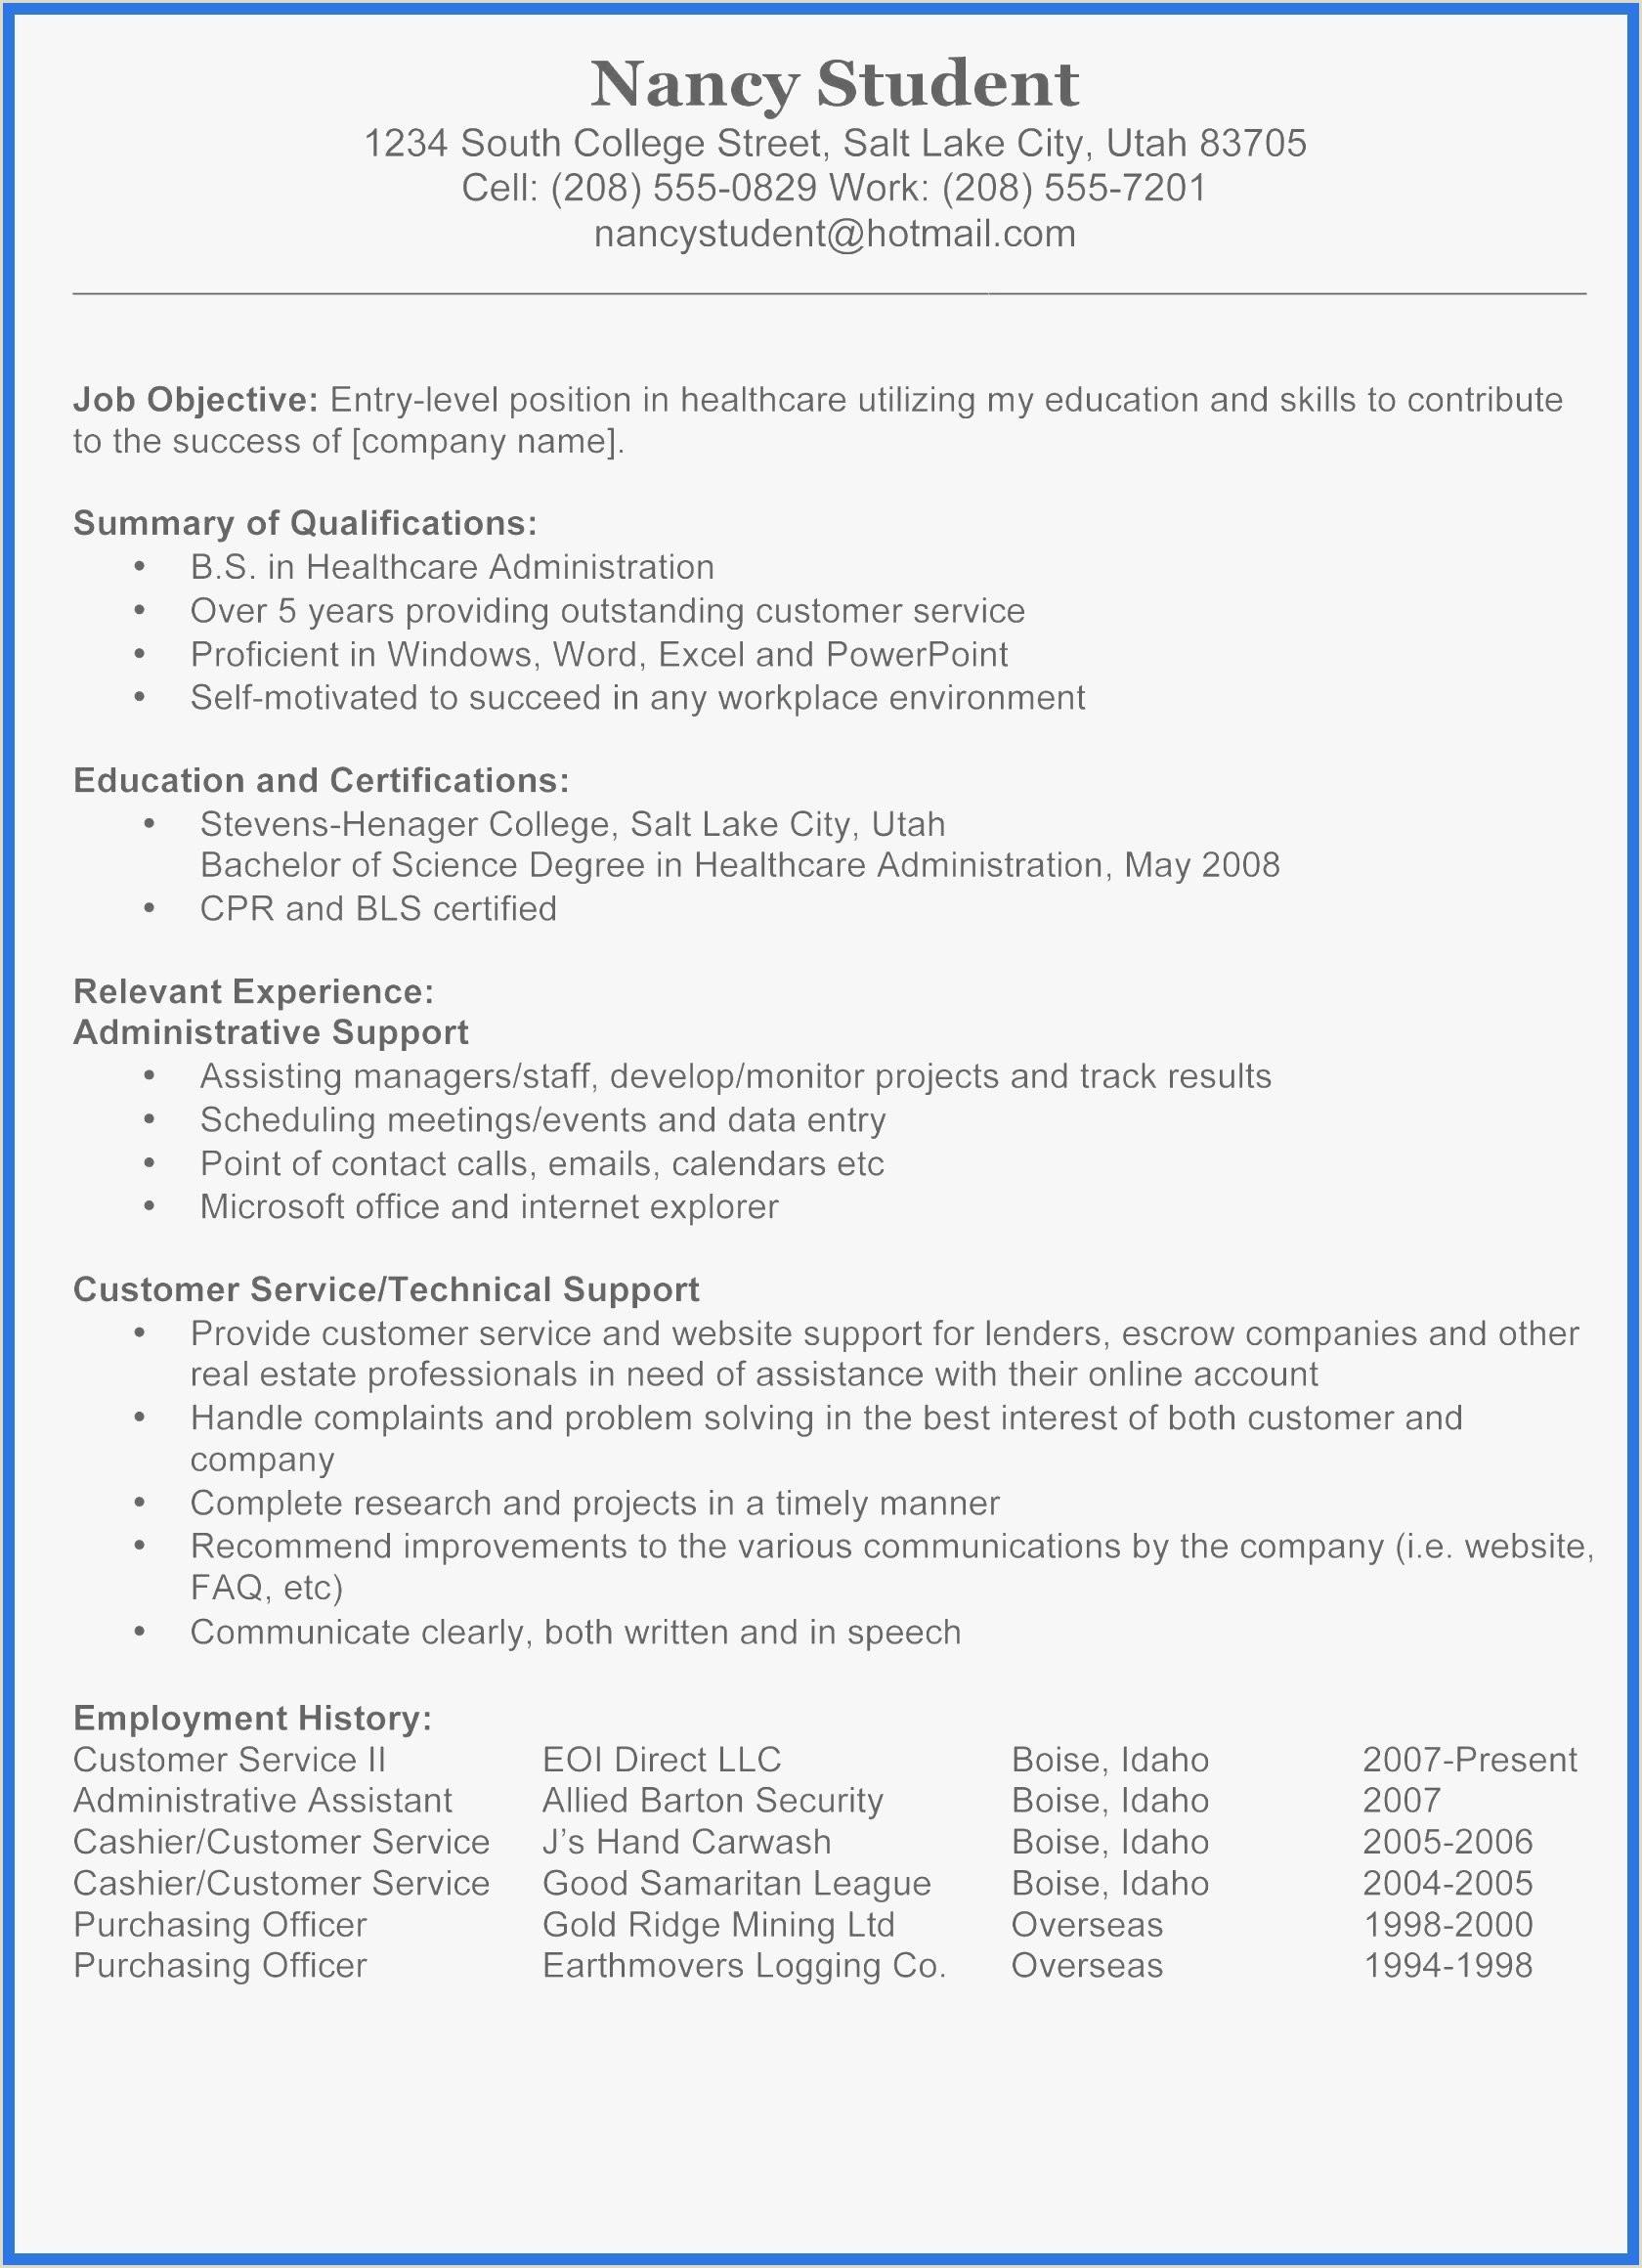 Customer Service associate Job Description Resume Free Powerpoint Templates for Cv Prestigious Resume Template